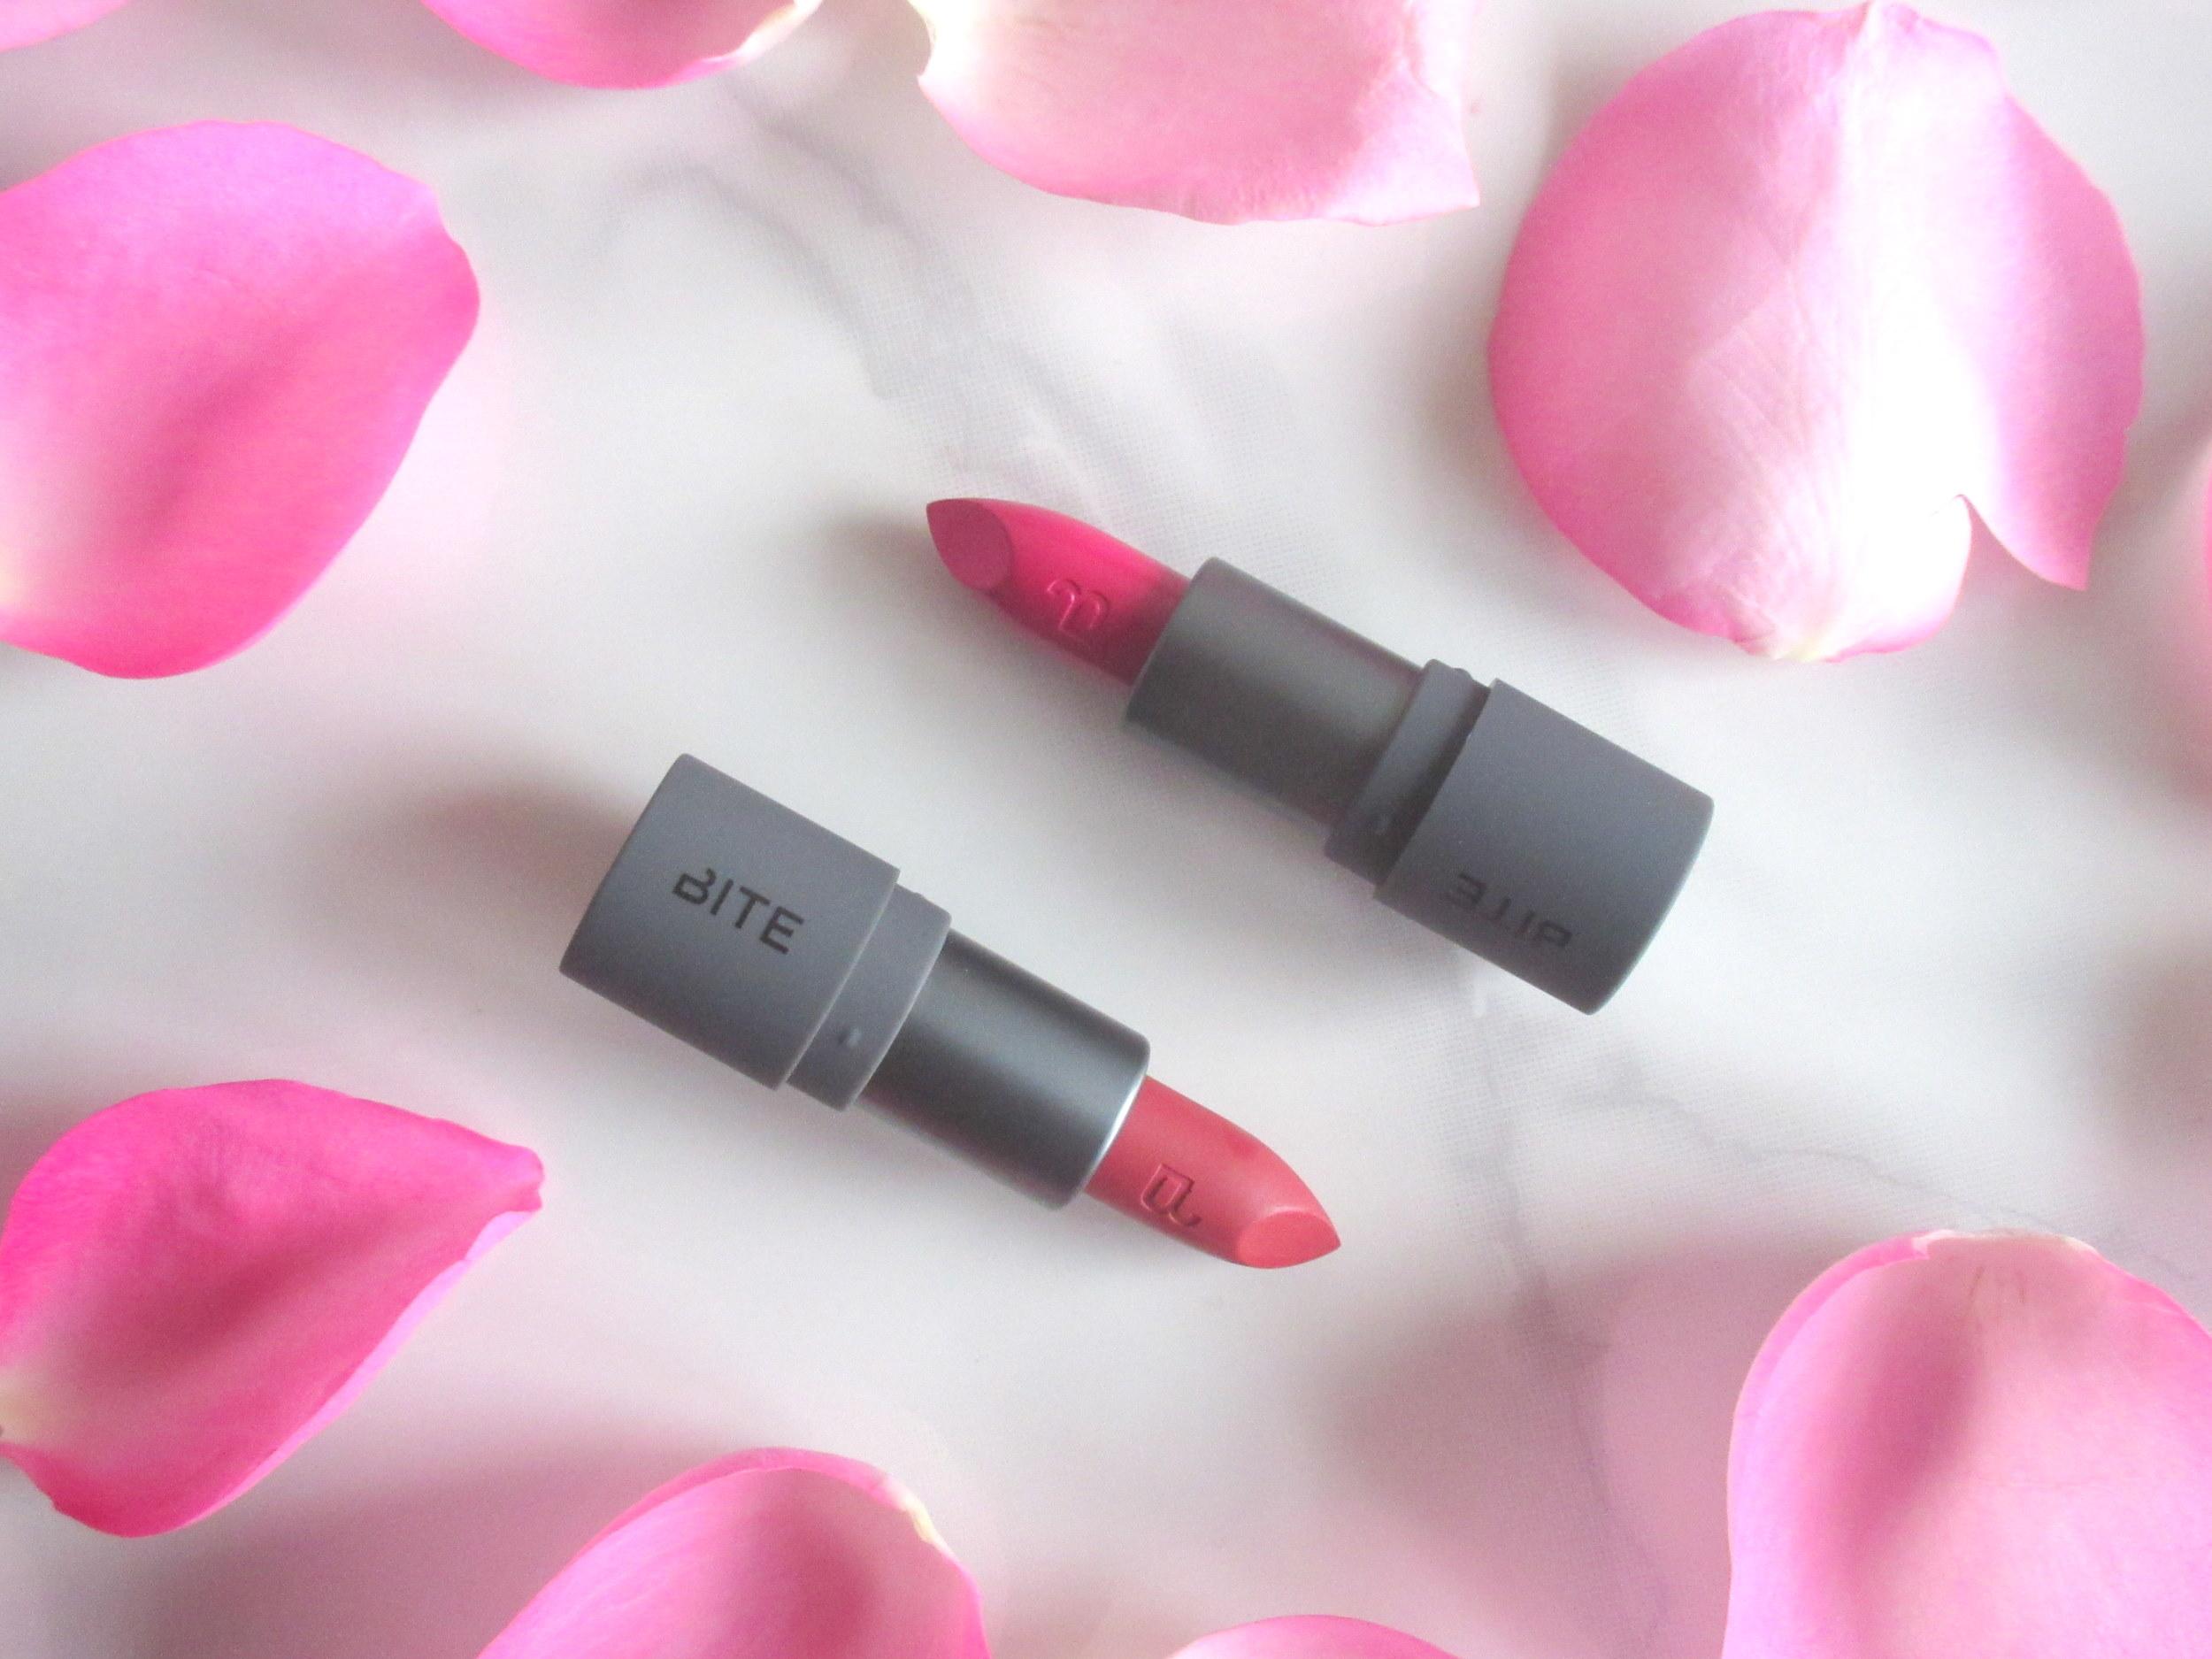 bite beauty amuse bouche mini lipstick set bold brights, bite beauty amuse bouche mini lipstick radish, bite beauty amuse bouche mini lipstick maple